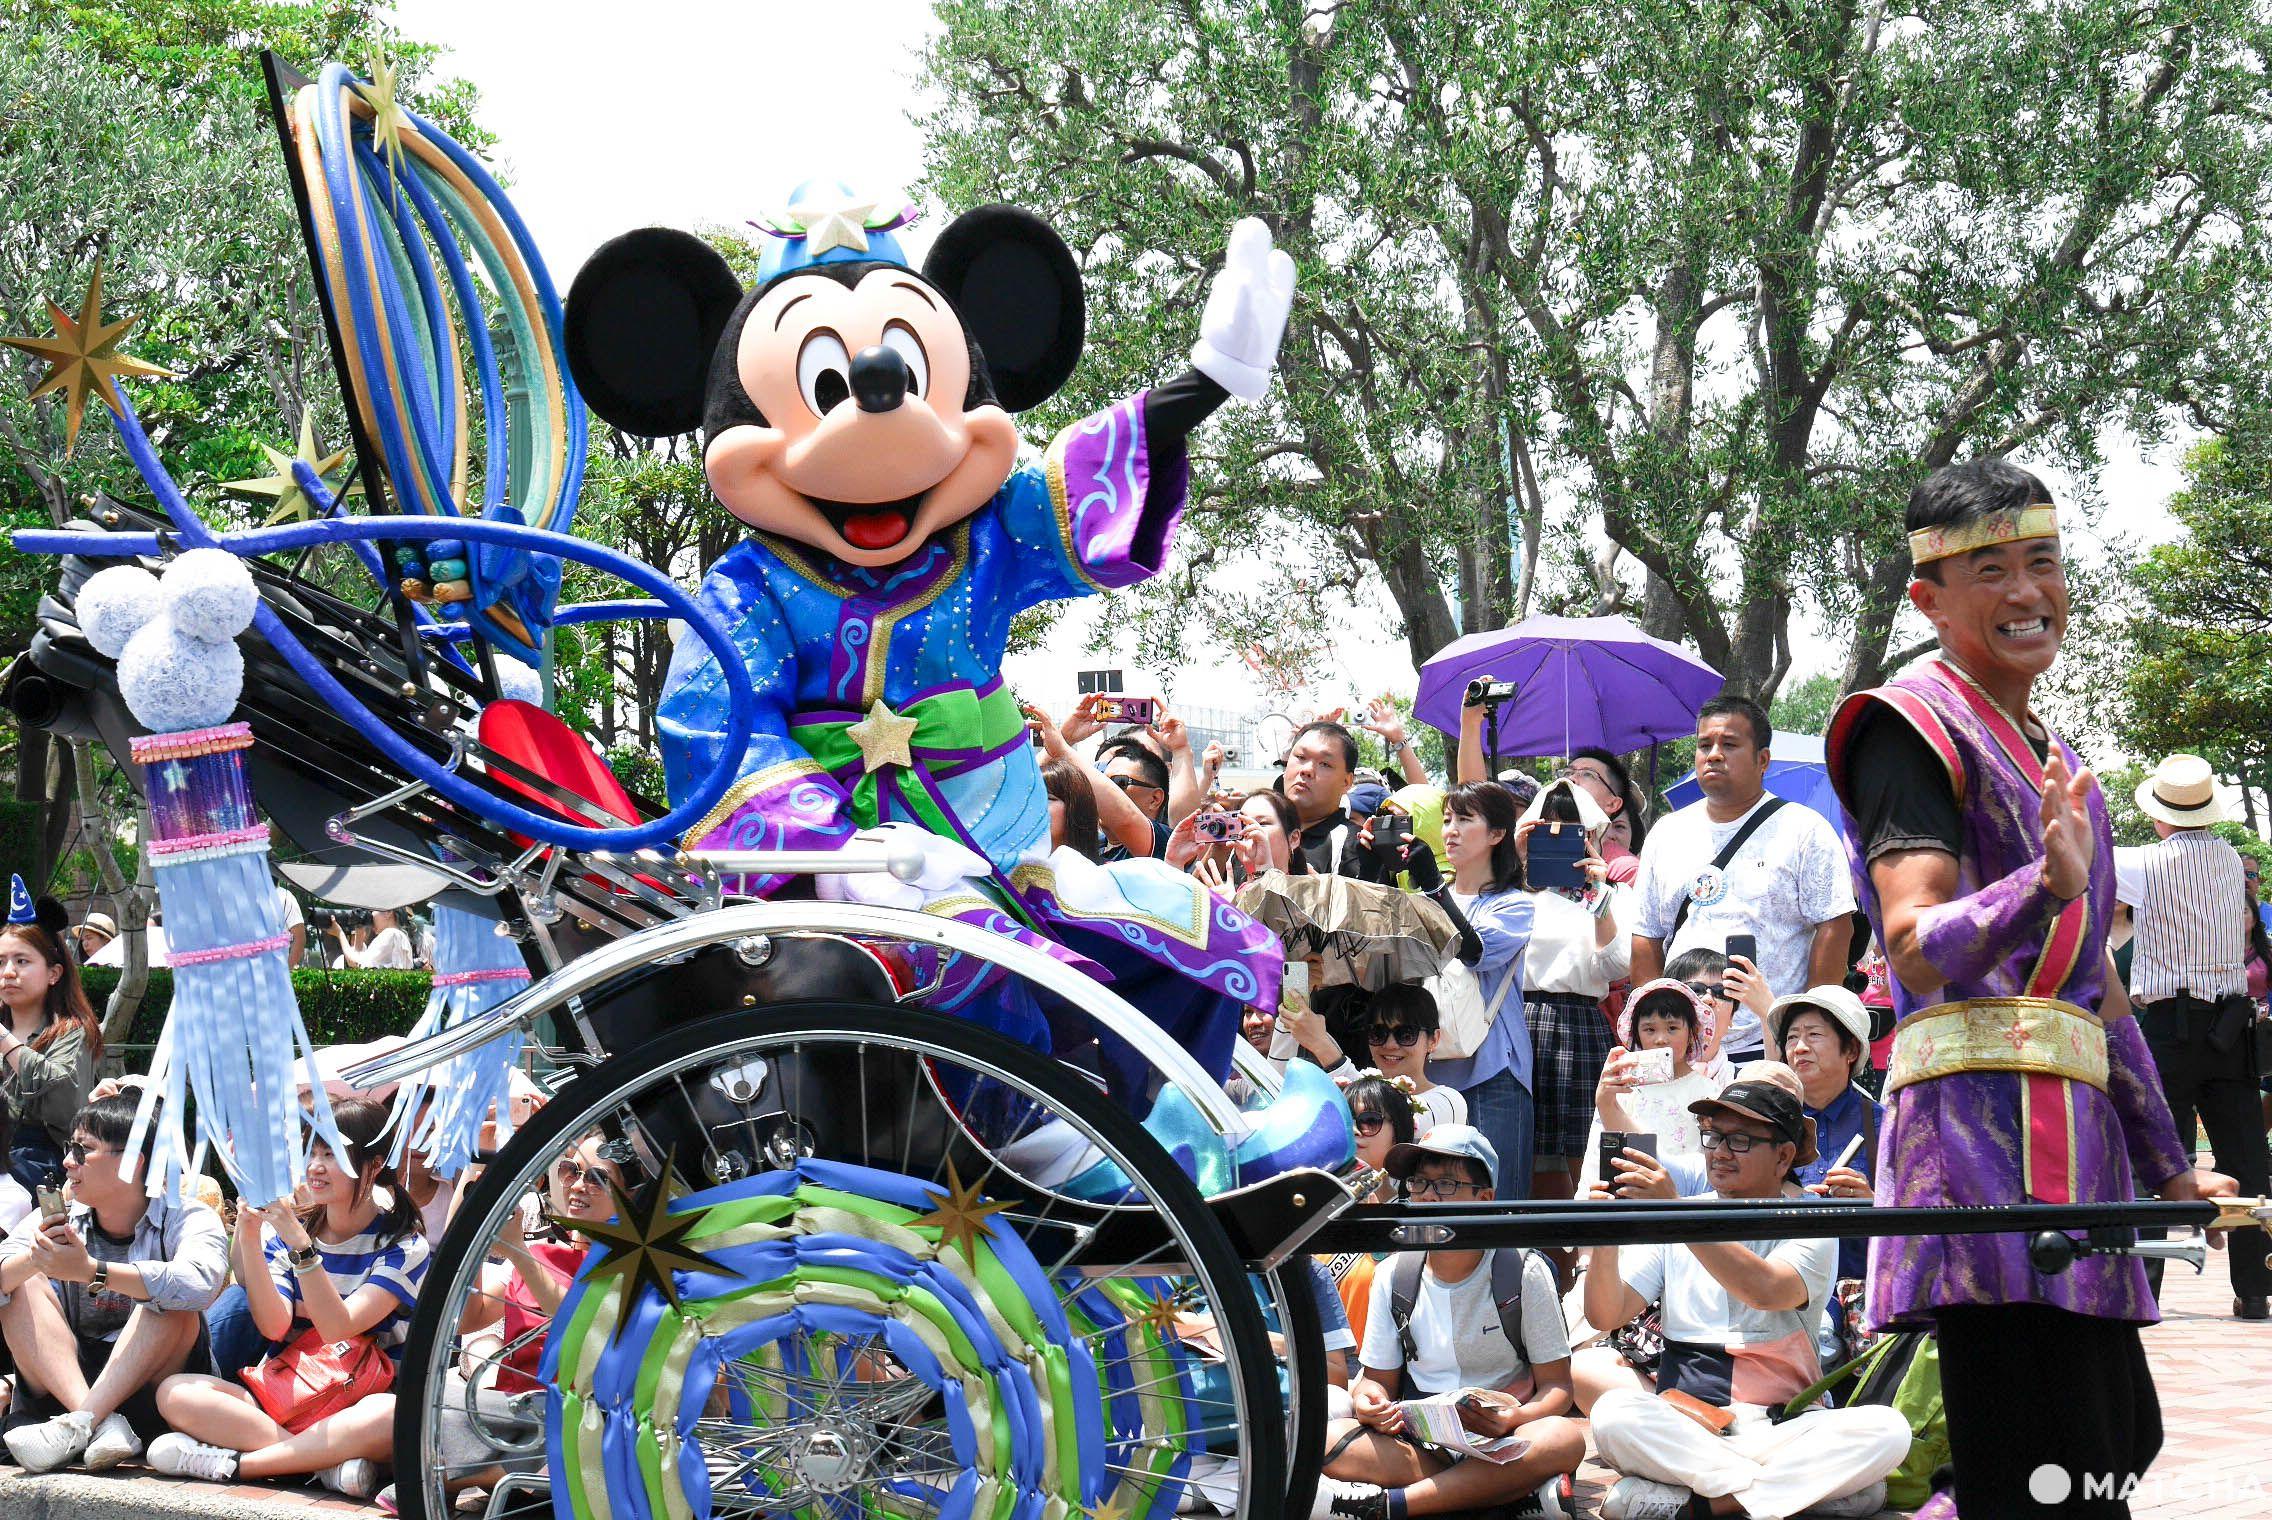 Tokyo Disneyland Summer 2019: Toy Story 4 And Tanabata Days | MATCHA